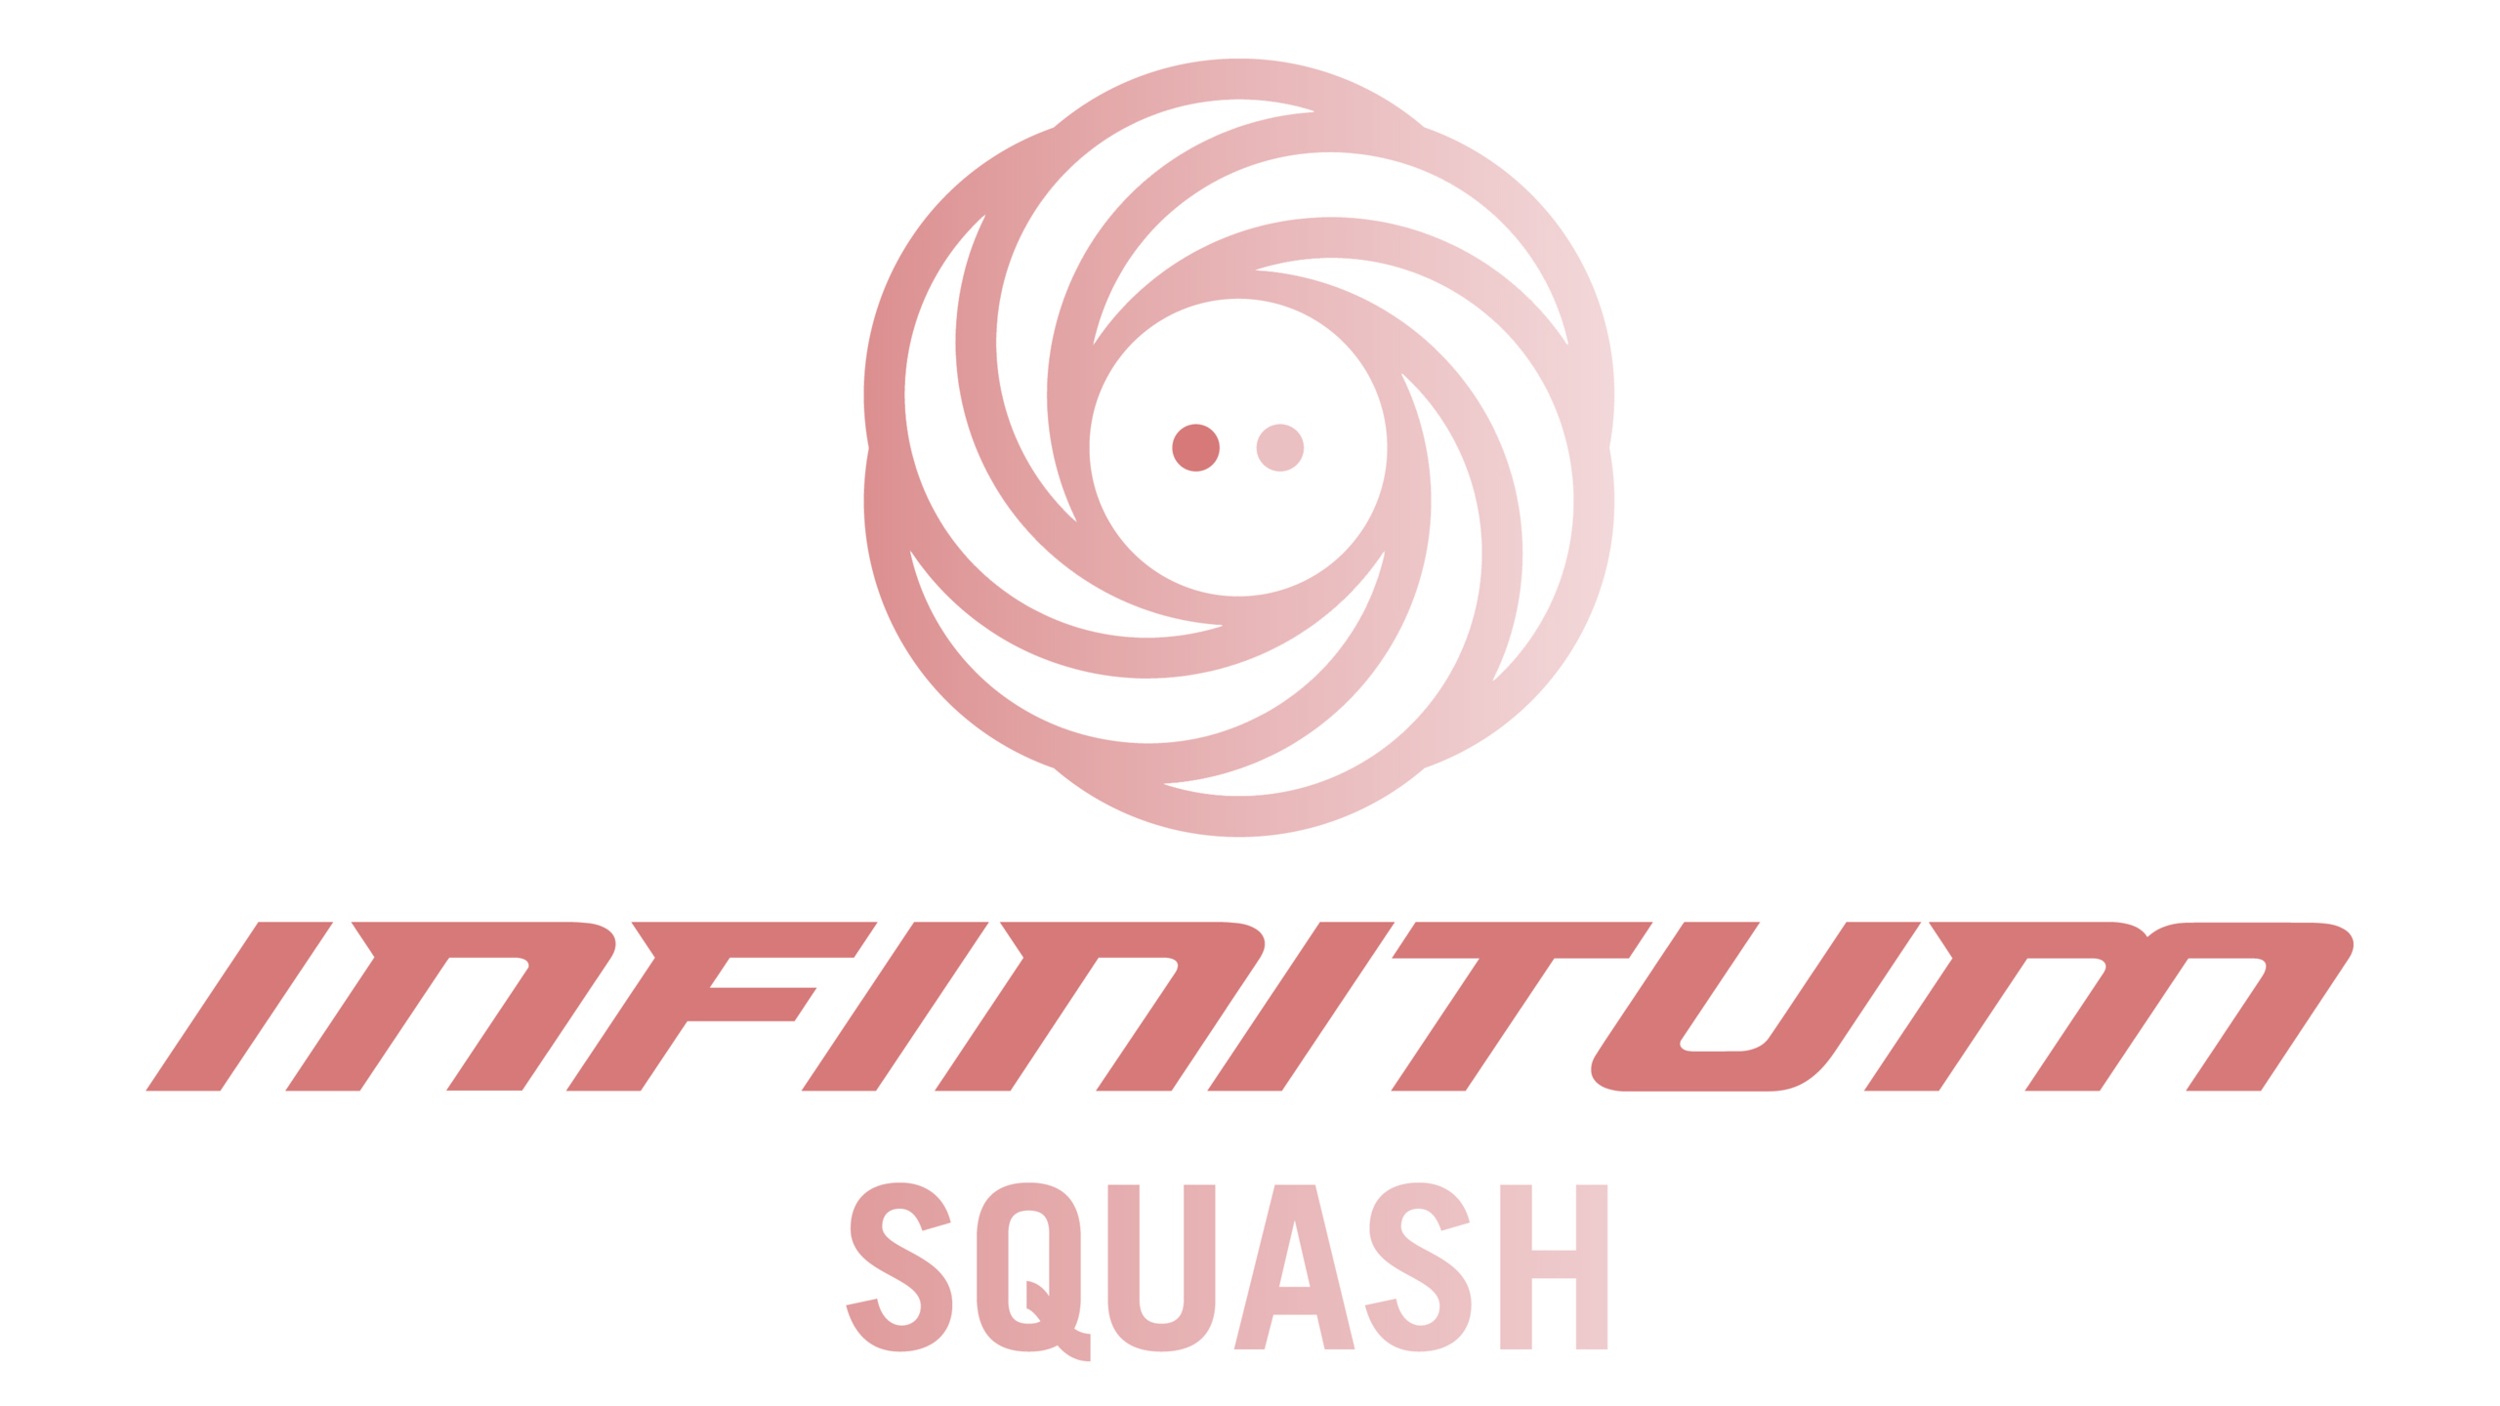 INFINITUM Squash logo color 1.png